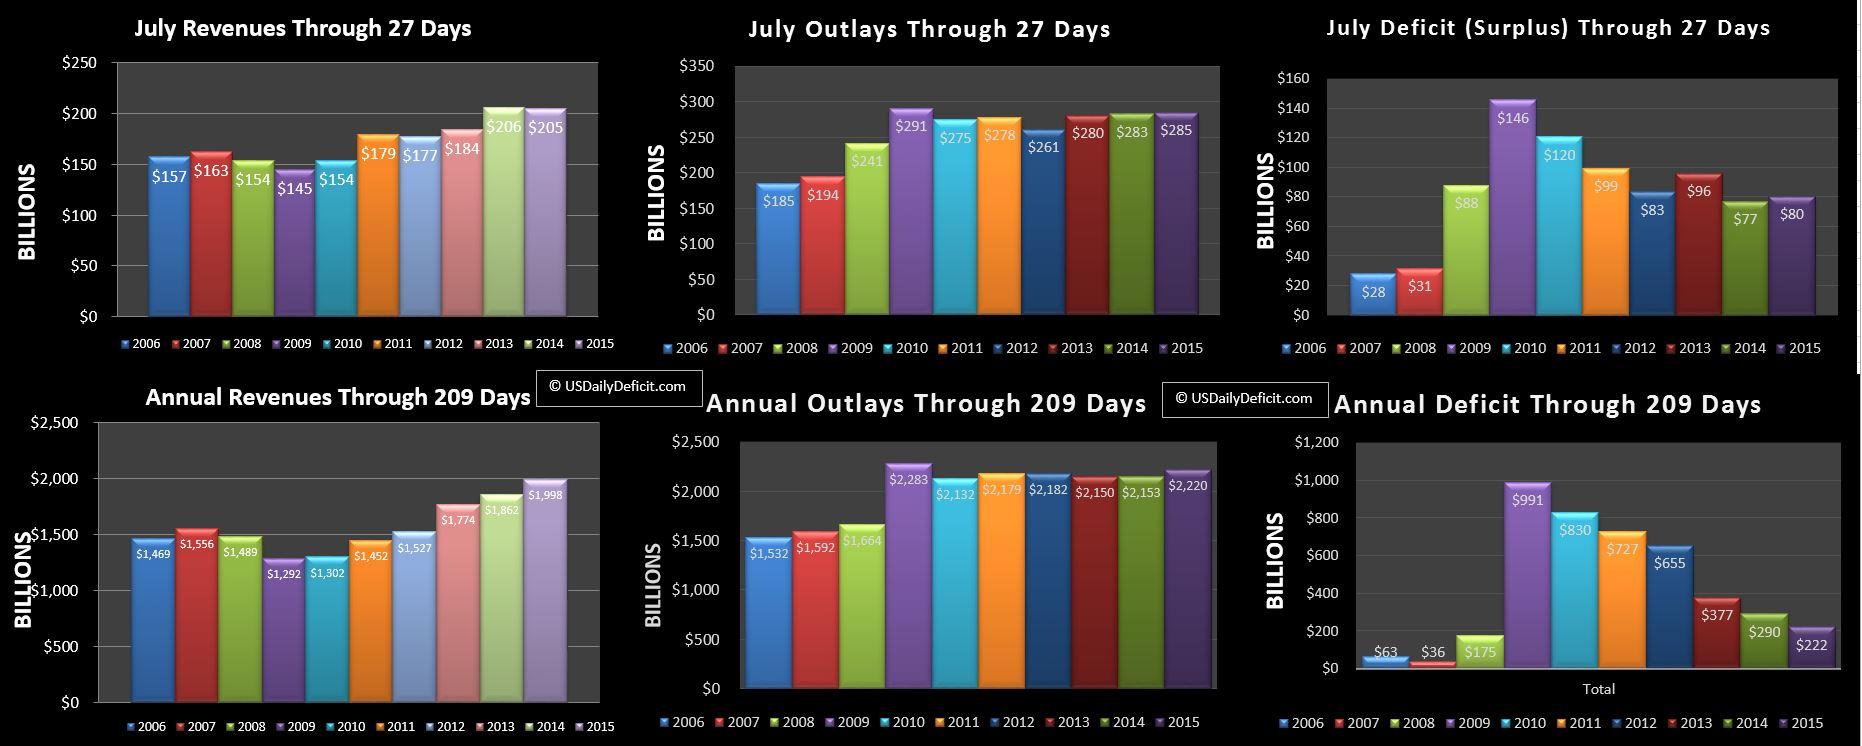 2015-07-27 USDD